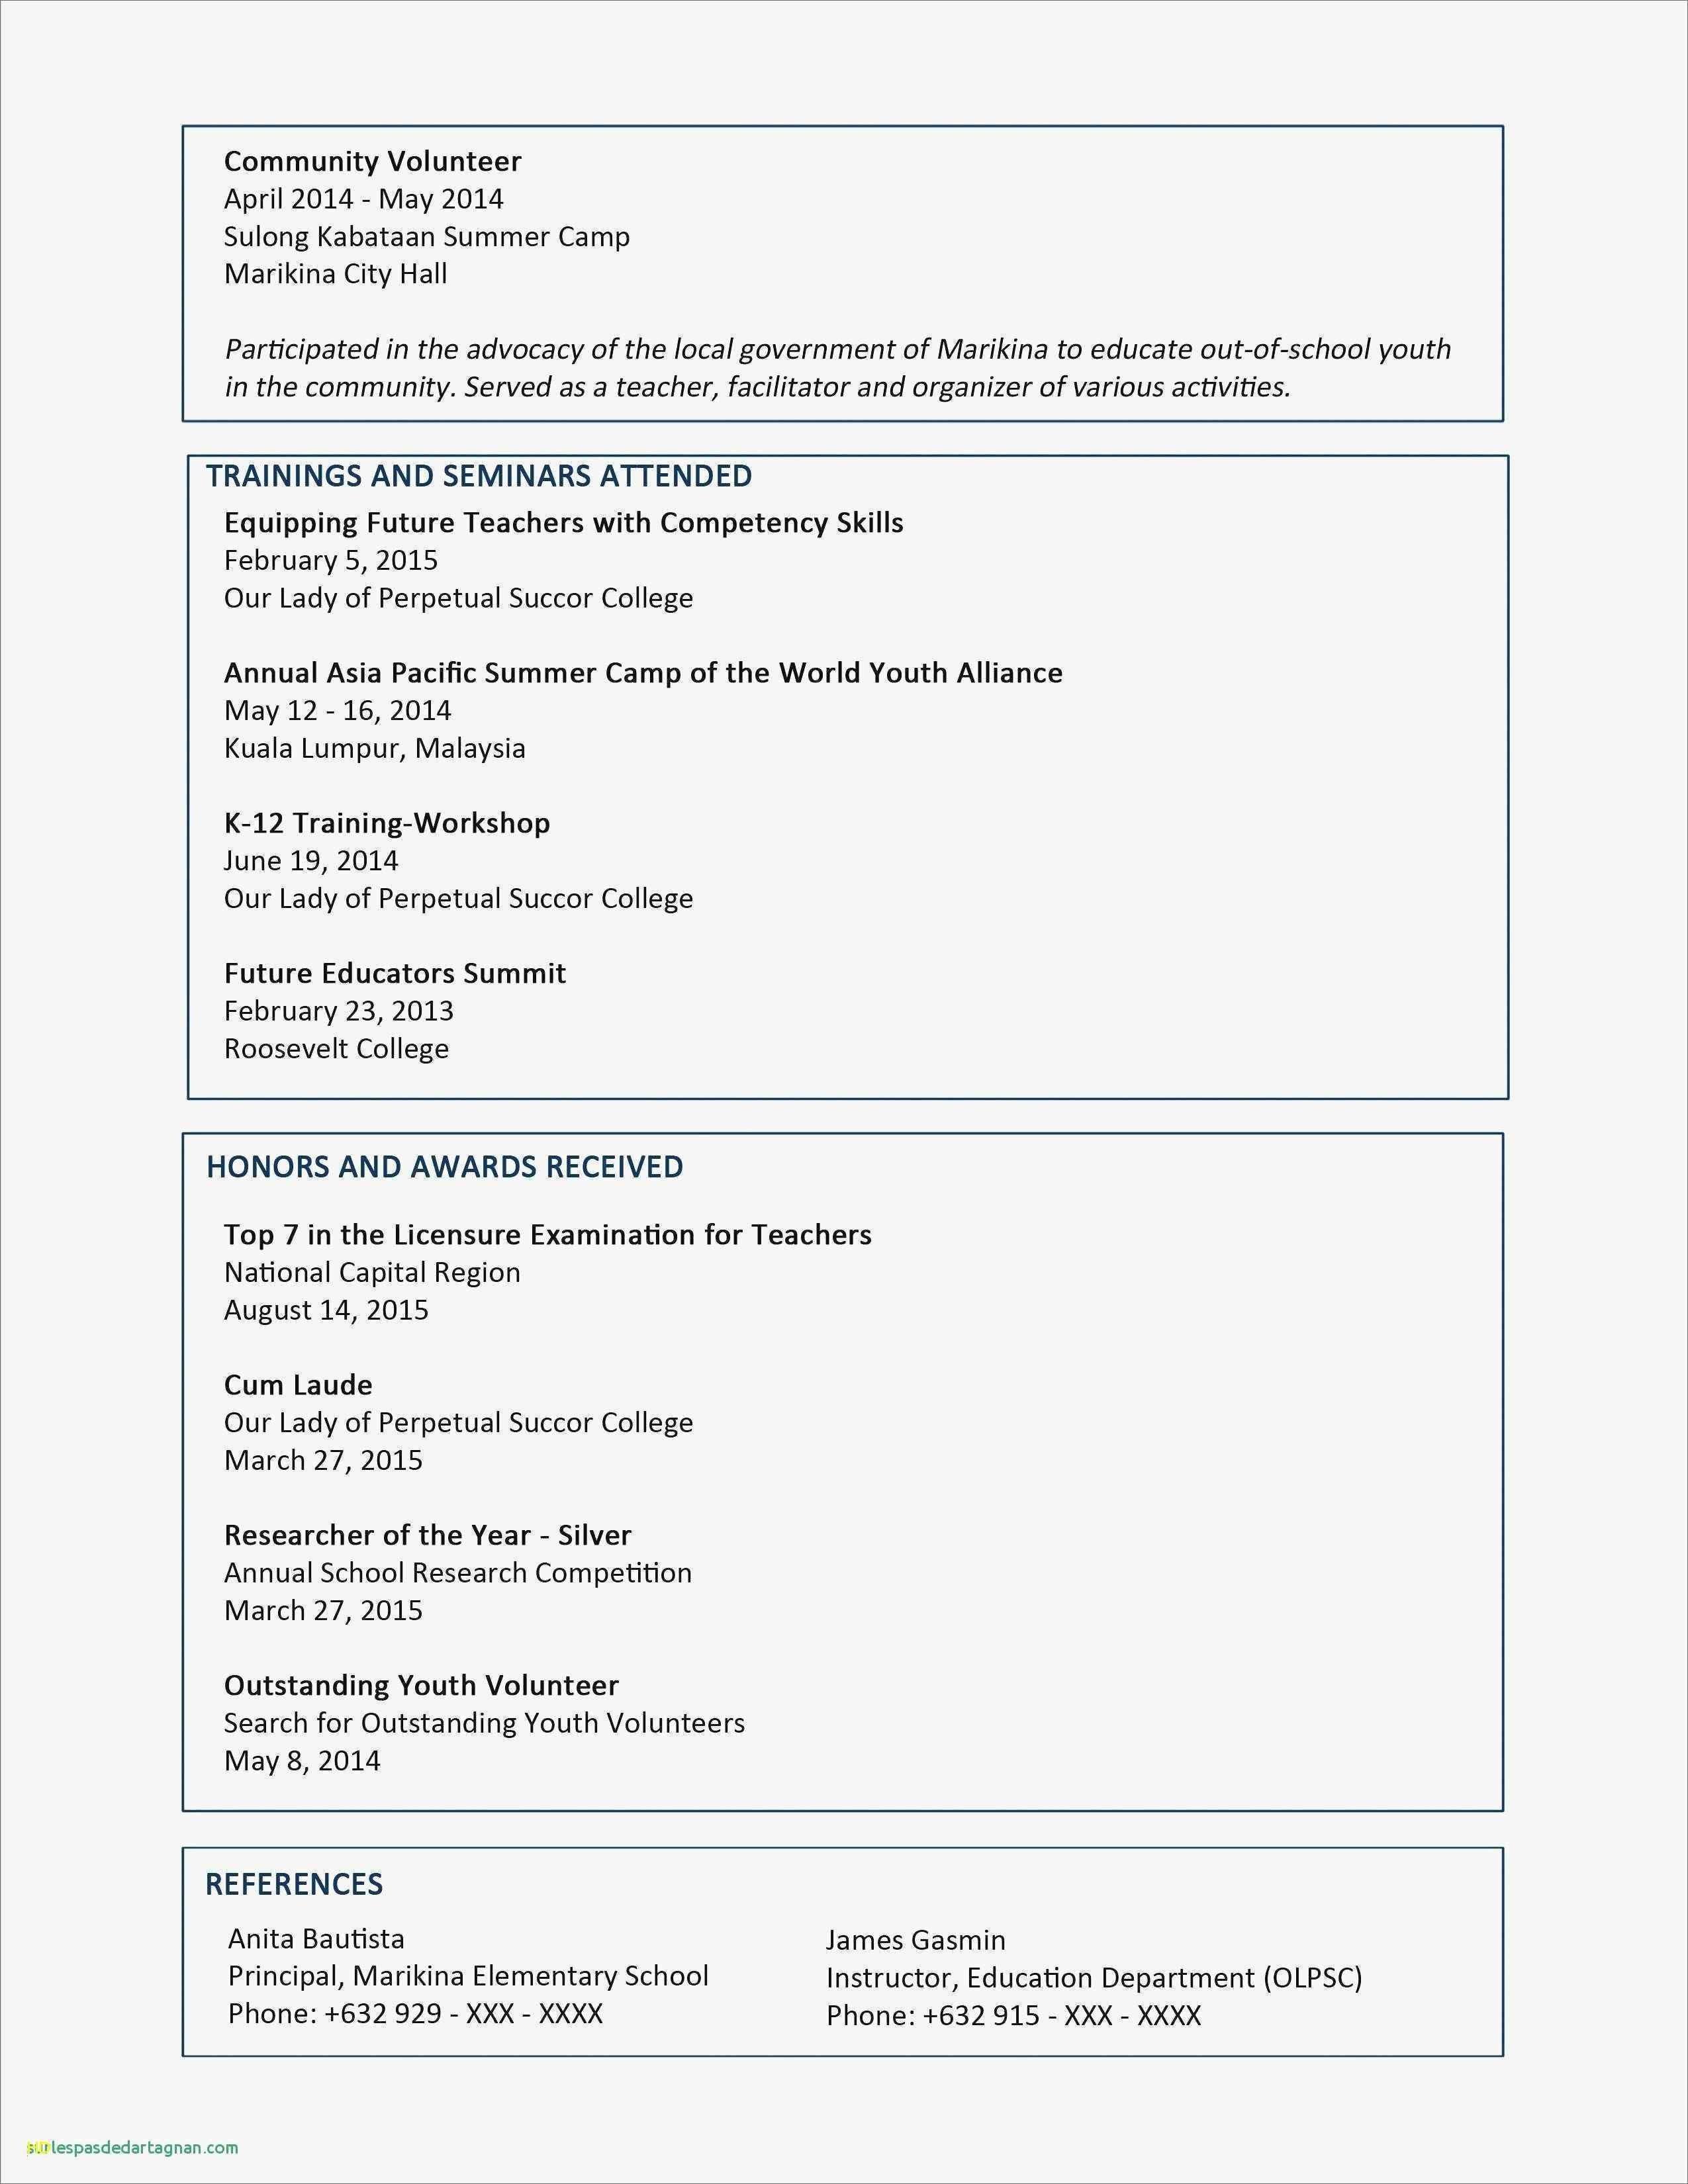 March Calendar 1999 Más Arriba-a-fecha Lebenslauf Deutsch Muster Ideen – Lebenslauf Auf Deutsch Elegant Of March Calendar 1999 Más Recientes Wo A2 Networked Interactive toy System Google Patents